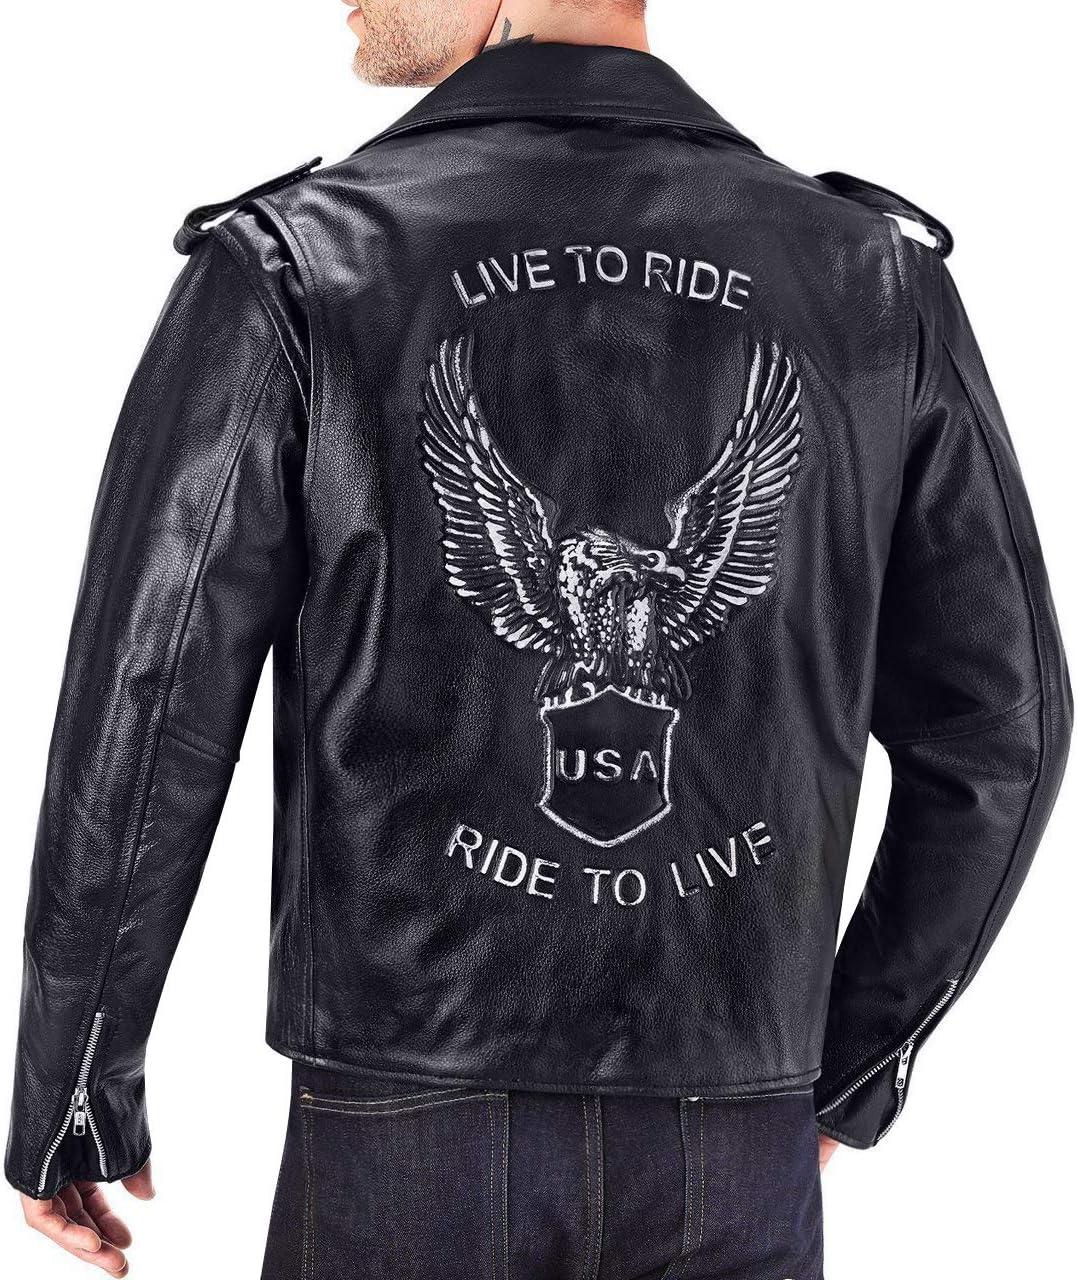 Viking Cycle American Eagle Premium Grade Cowhide Leather Motorcycle Jacket for Men (Medium)